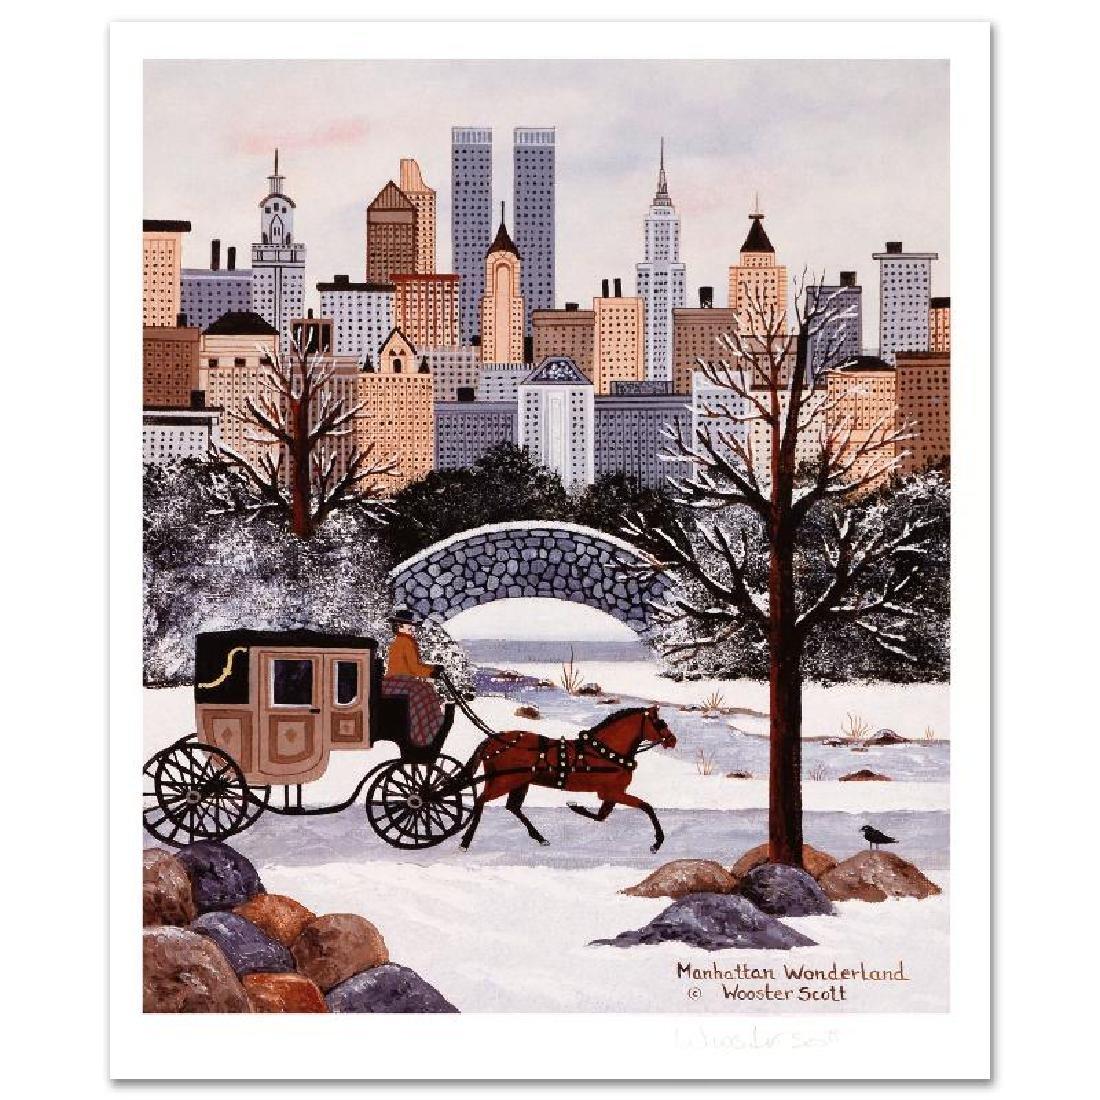 Manhattan Wonderland Limited Edition Lithograph by Jane - 2